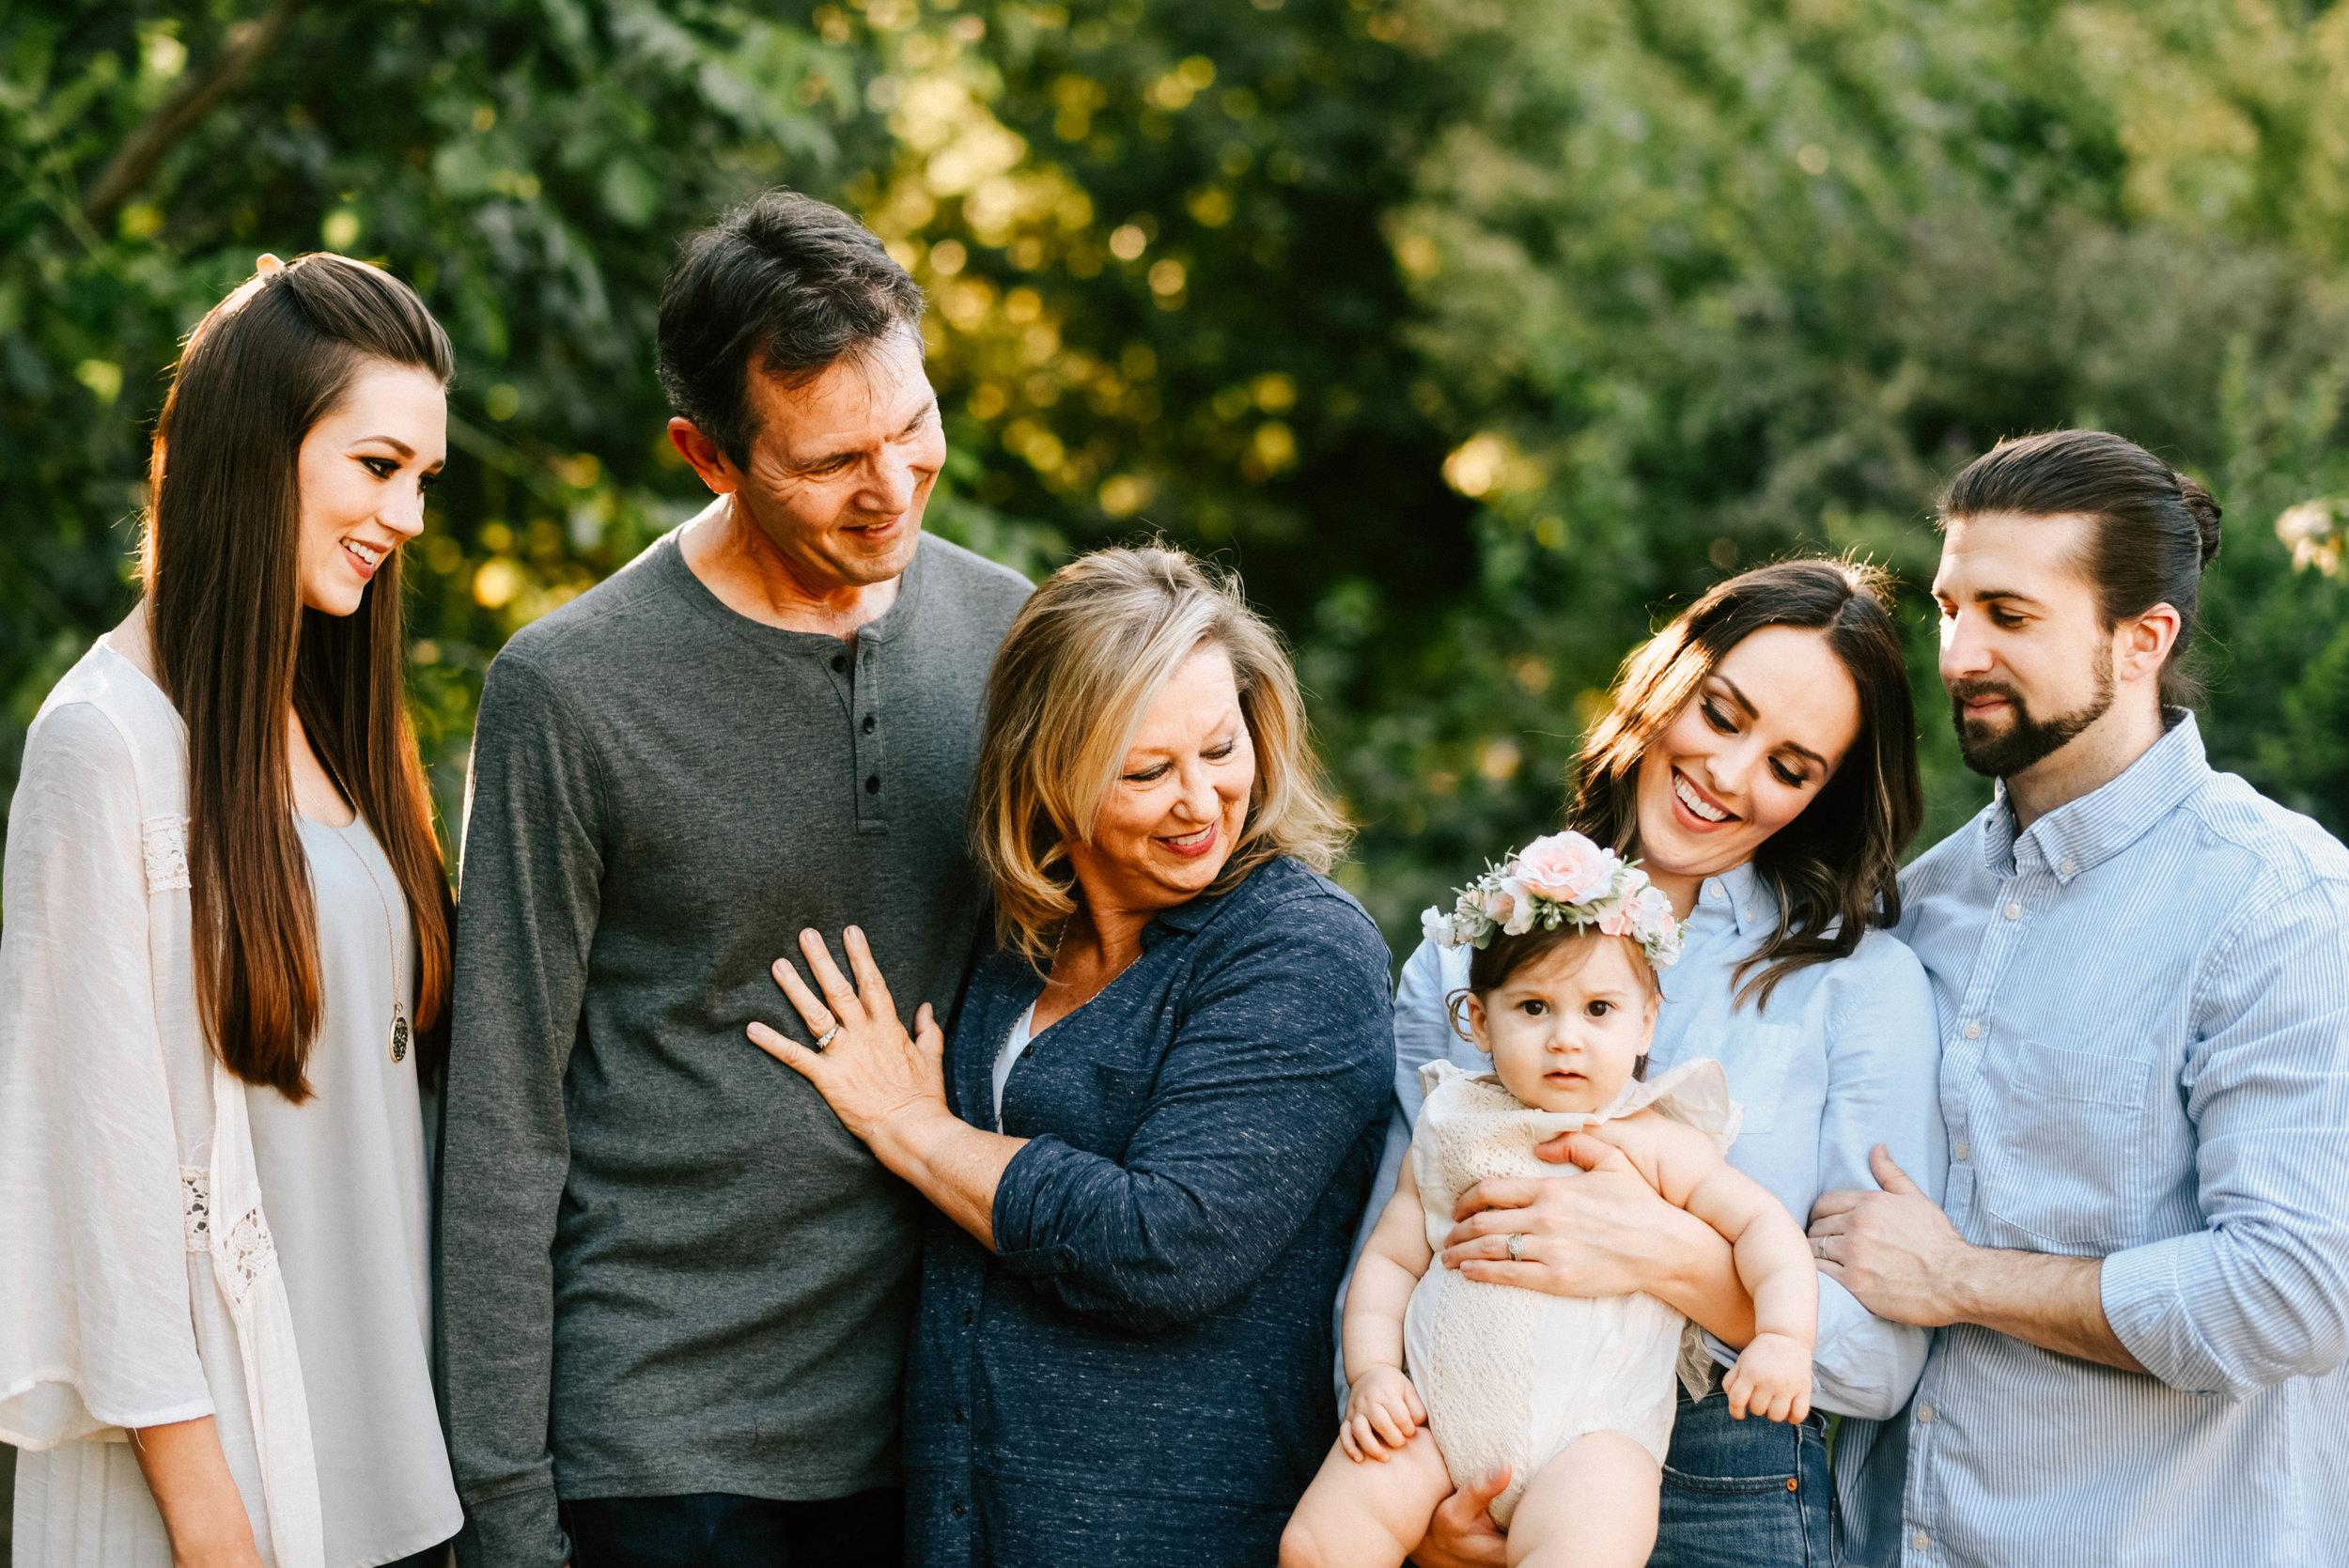 alyssajoyner+family-7.jpg